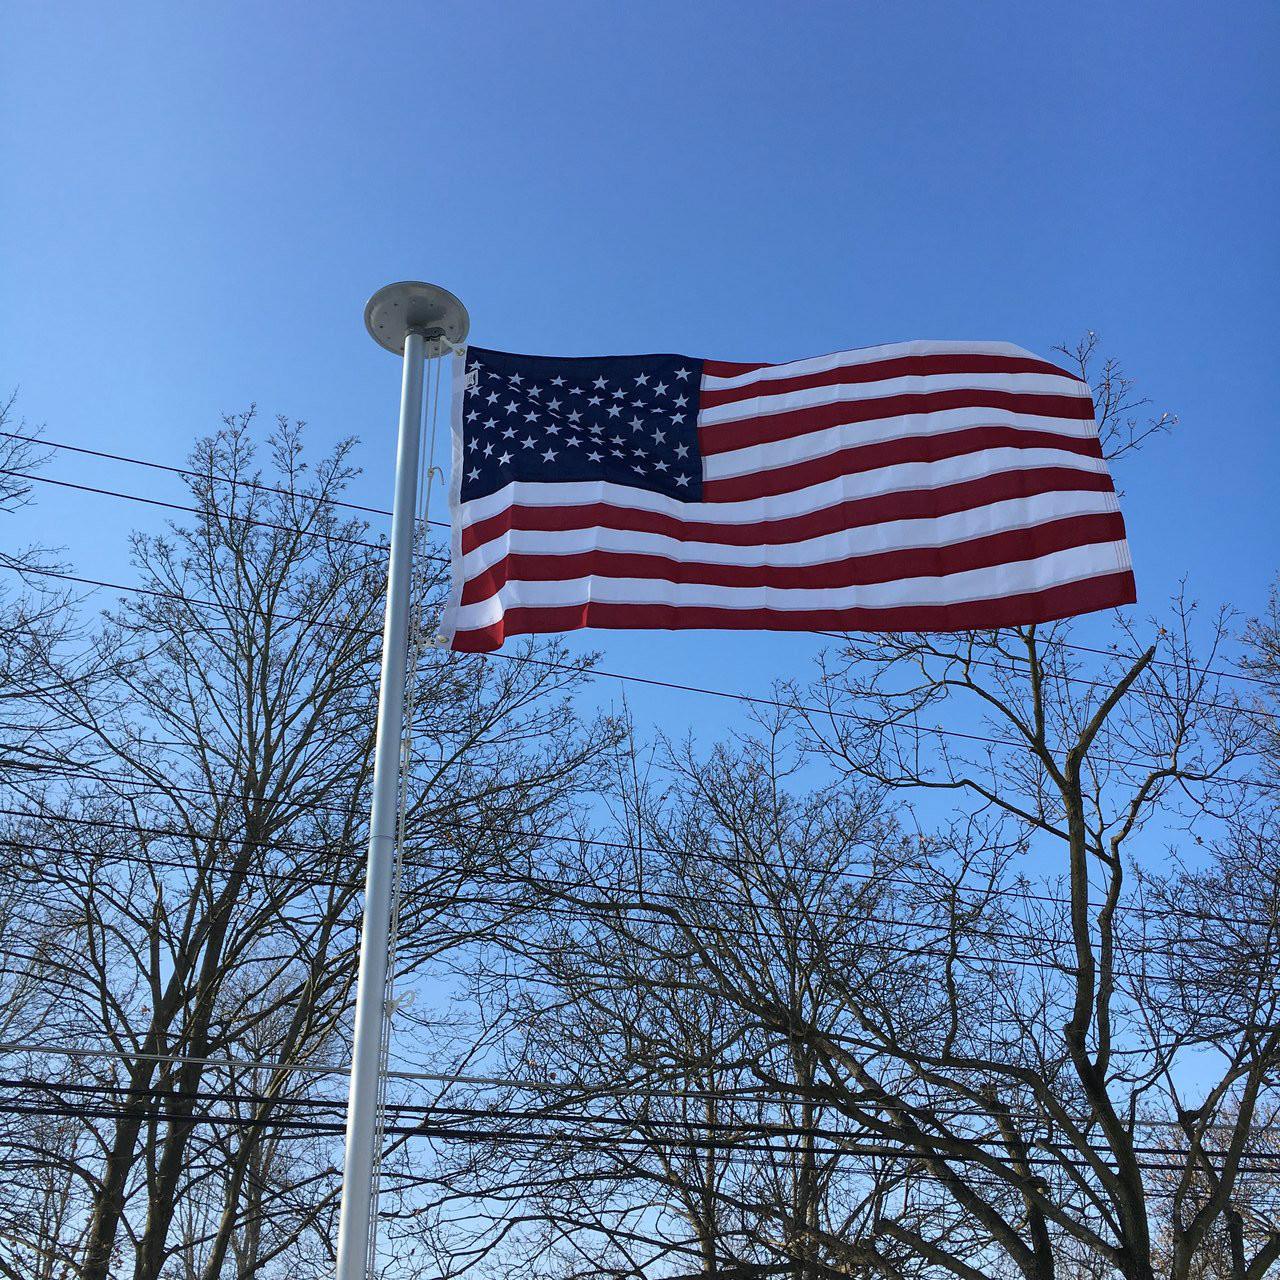 ac4379171a2 Poly-Max U.S. Flag 100% made in U.S.A. by Eder Flag